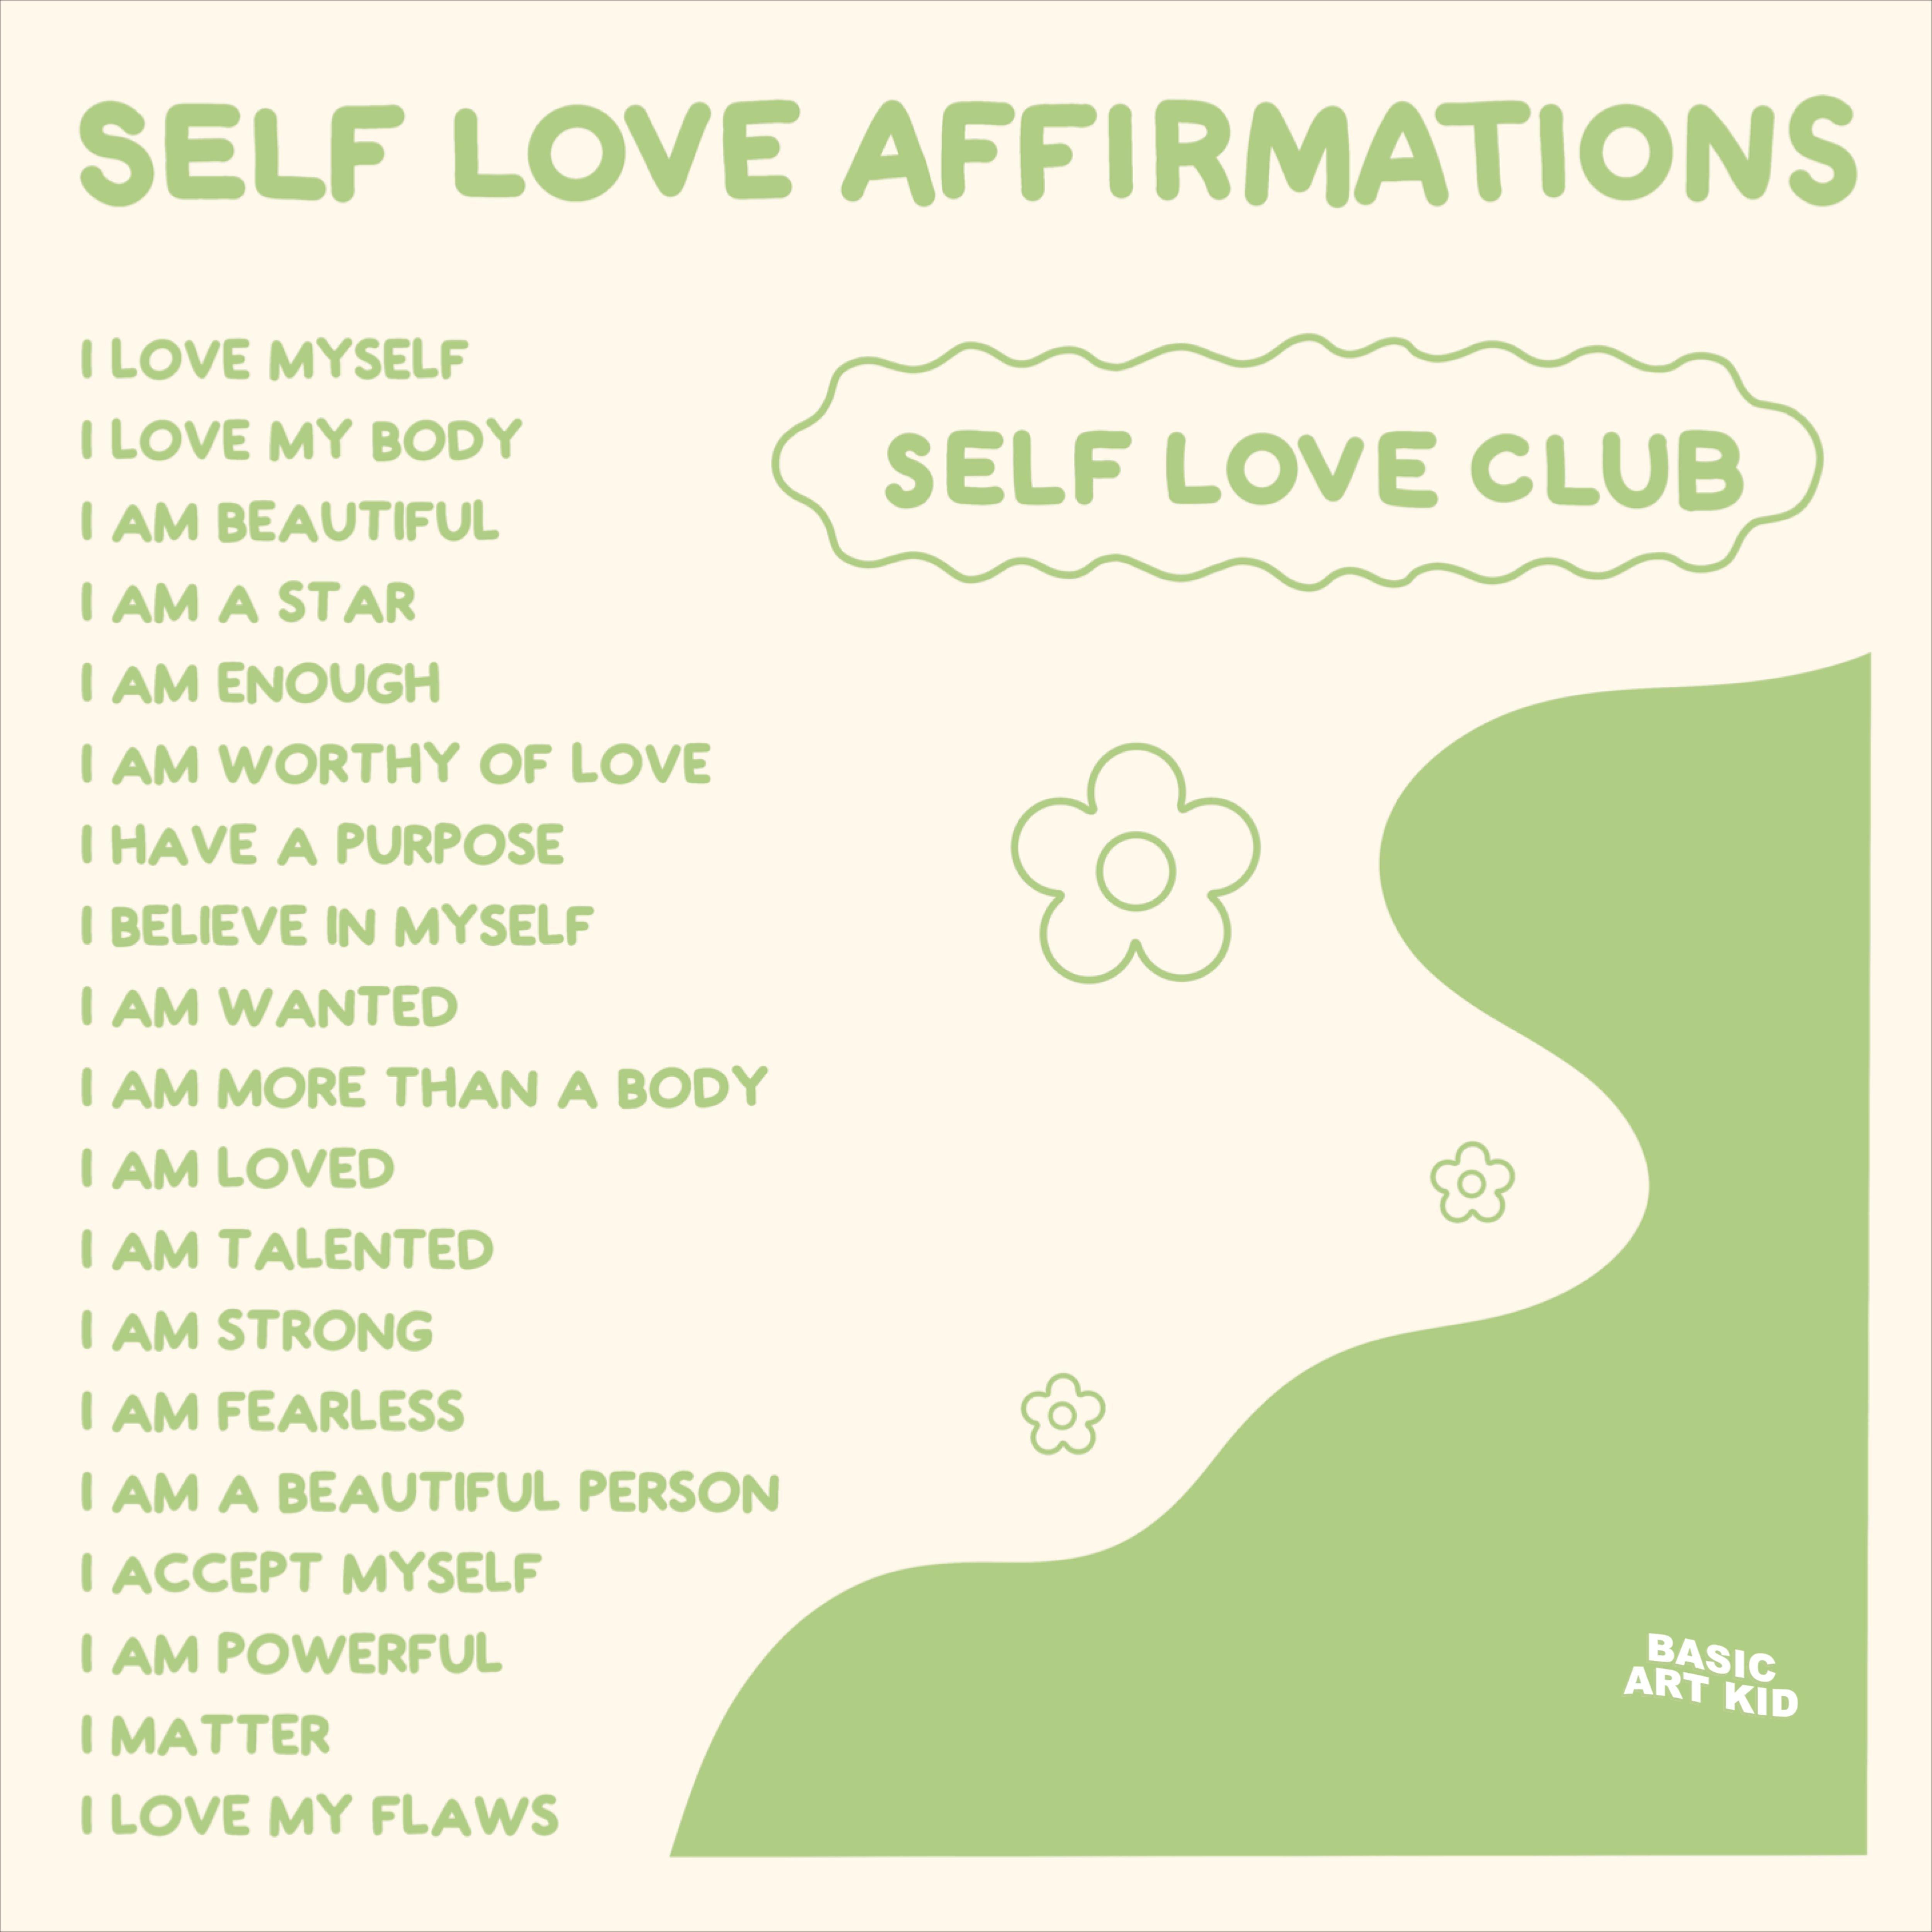 Green aesthetic self love art print! Self love affirmations!